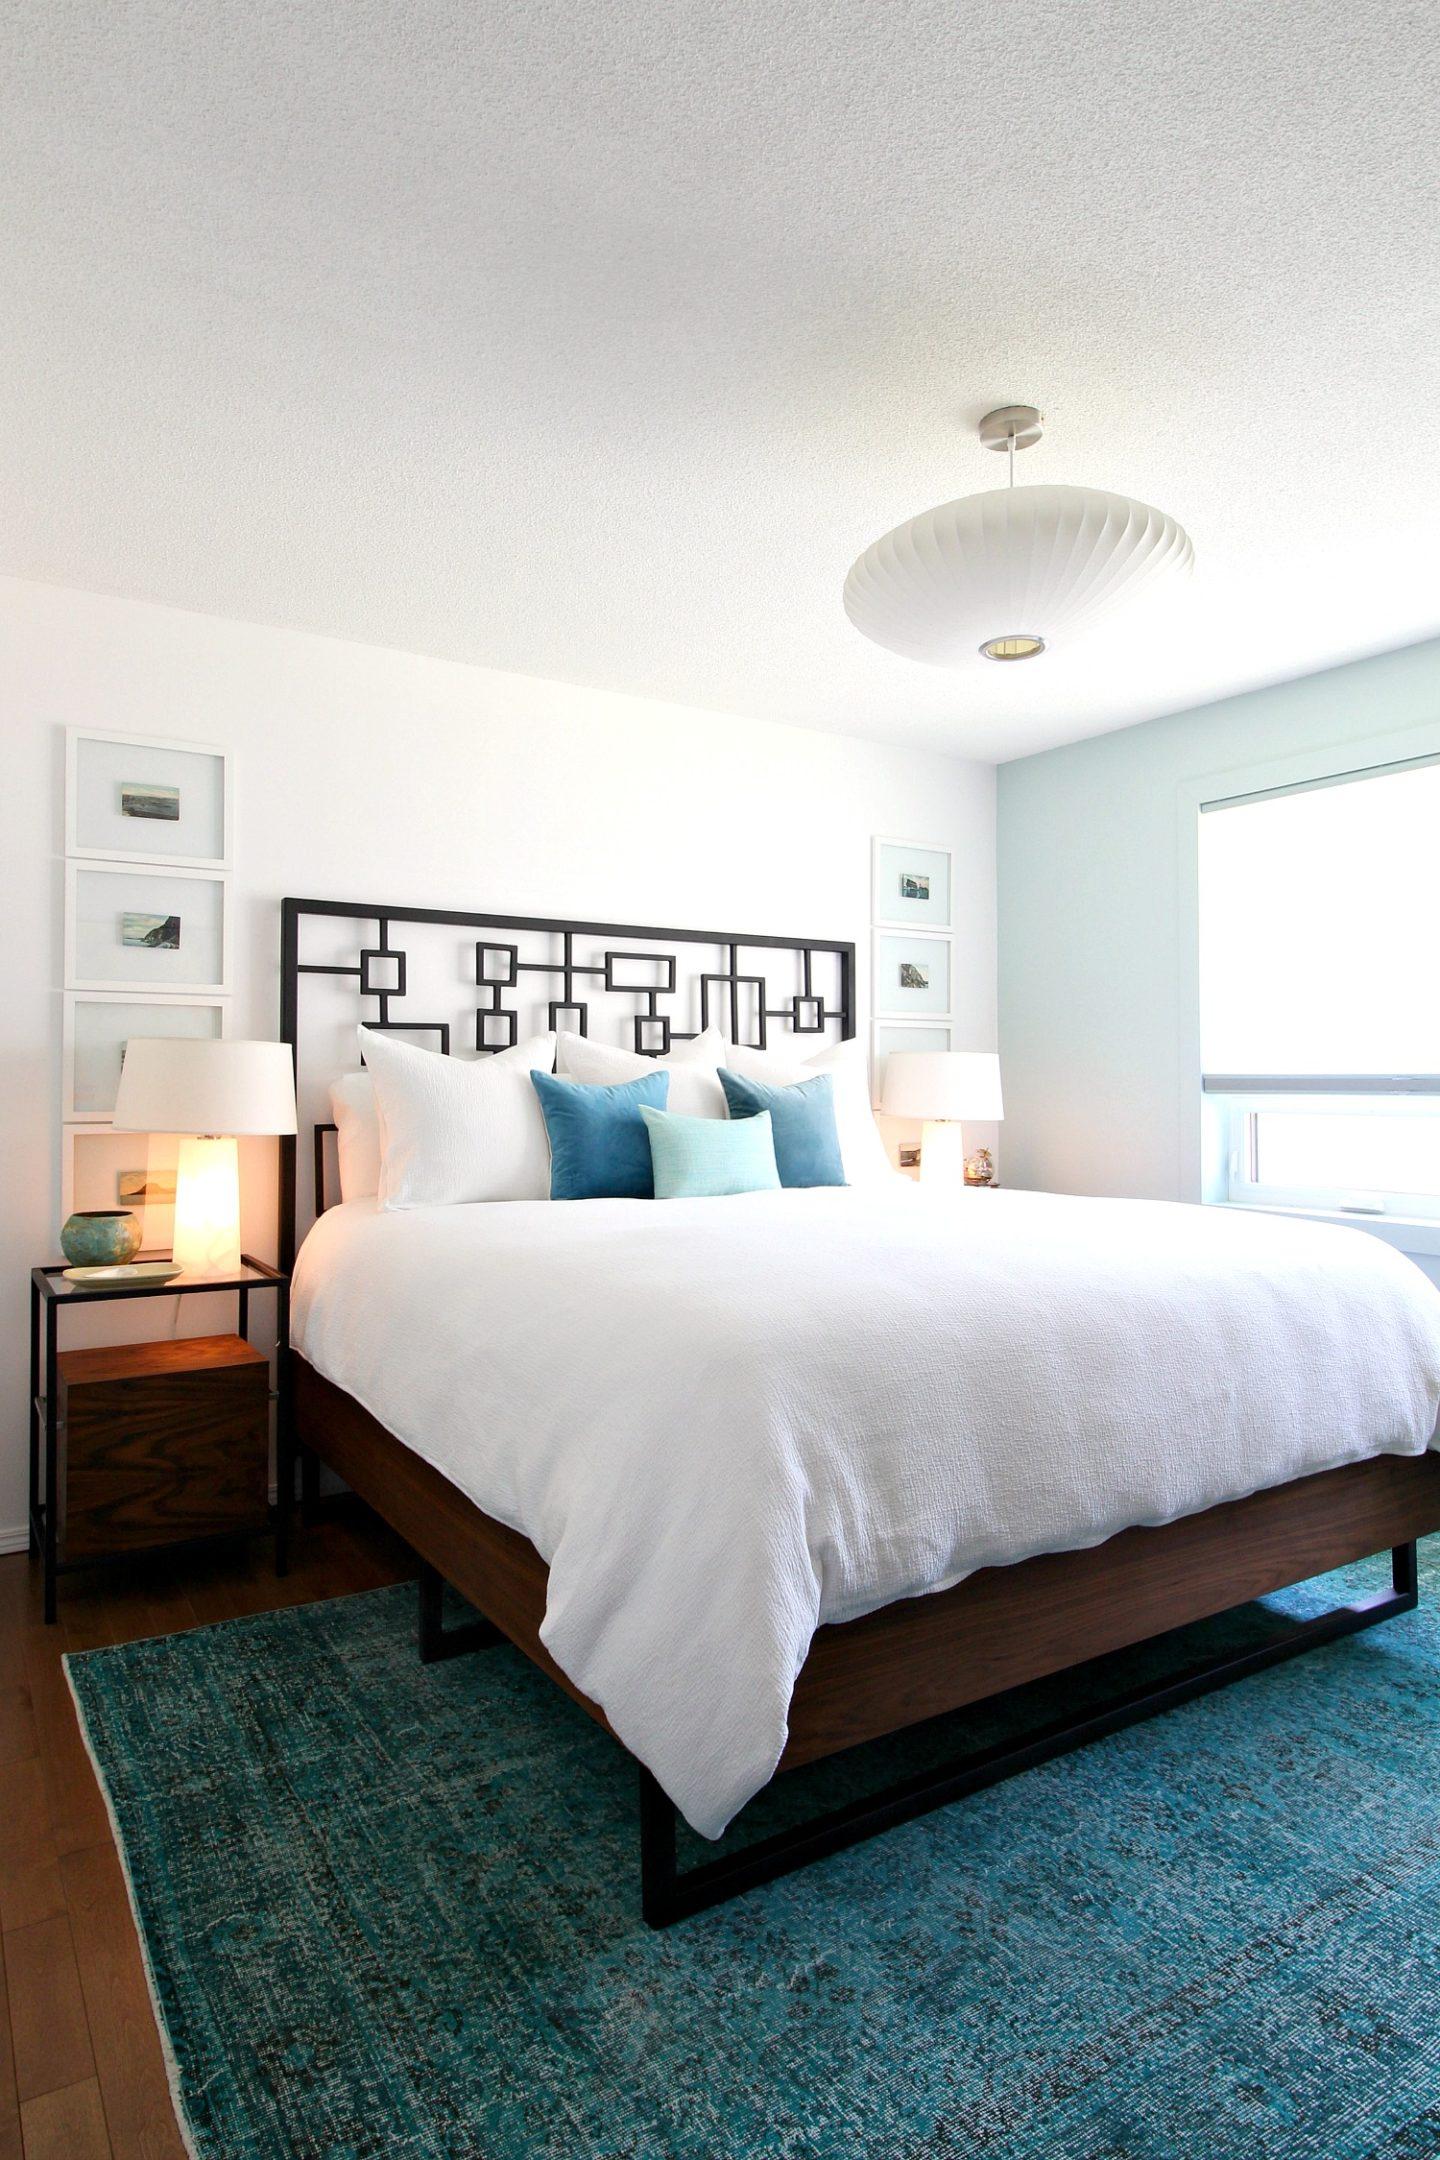 Lakehouse Bedroom with Vintage Rug